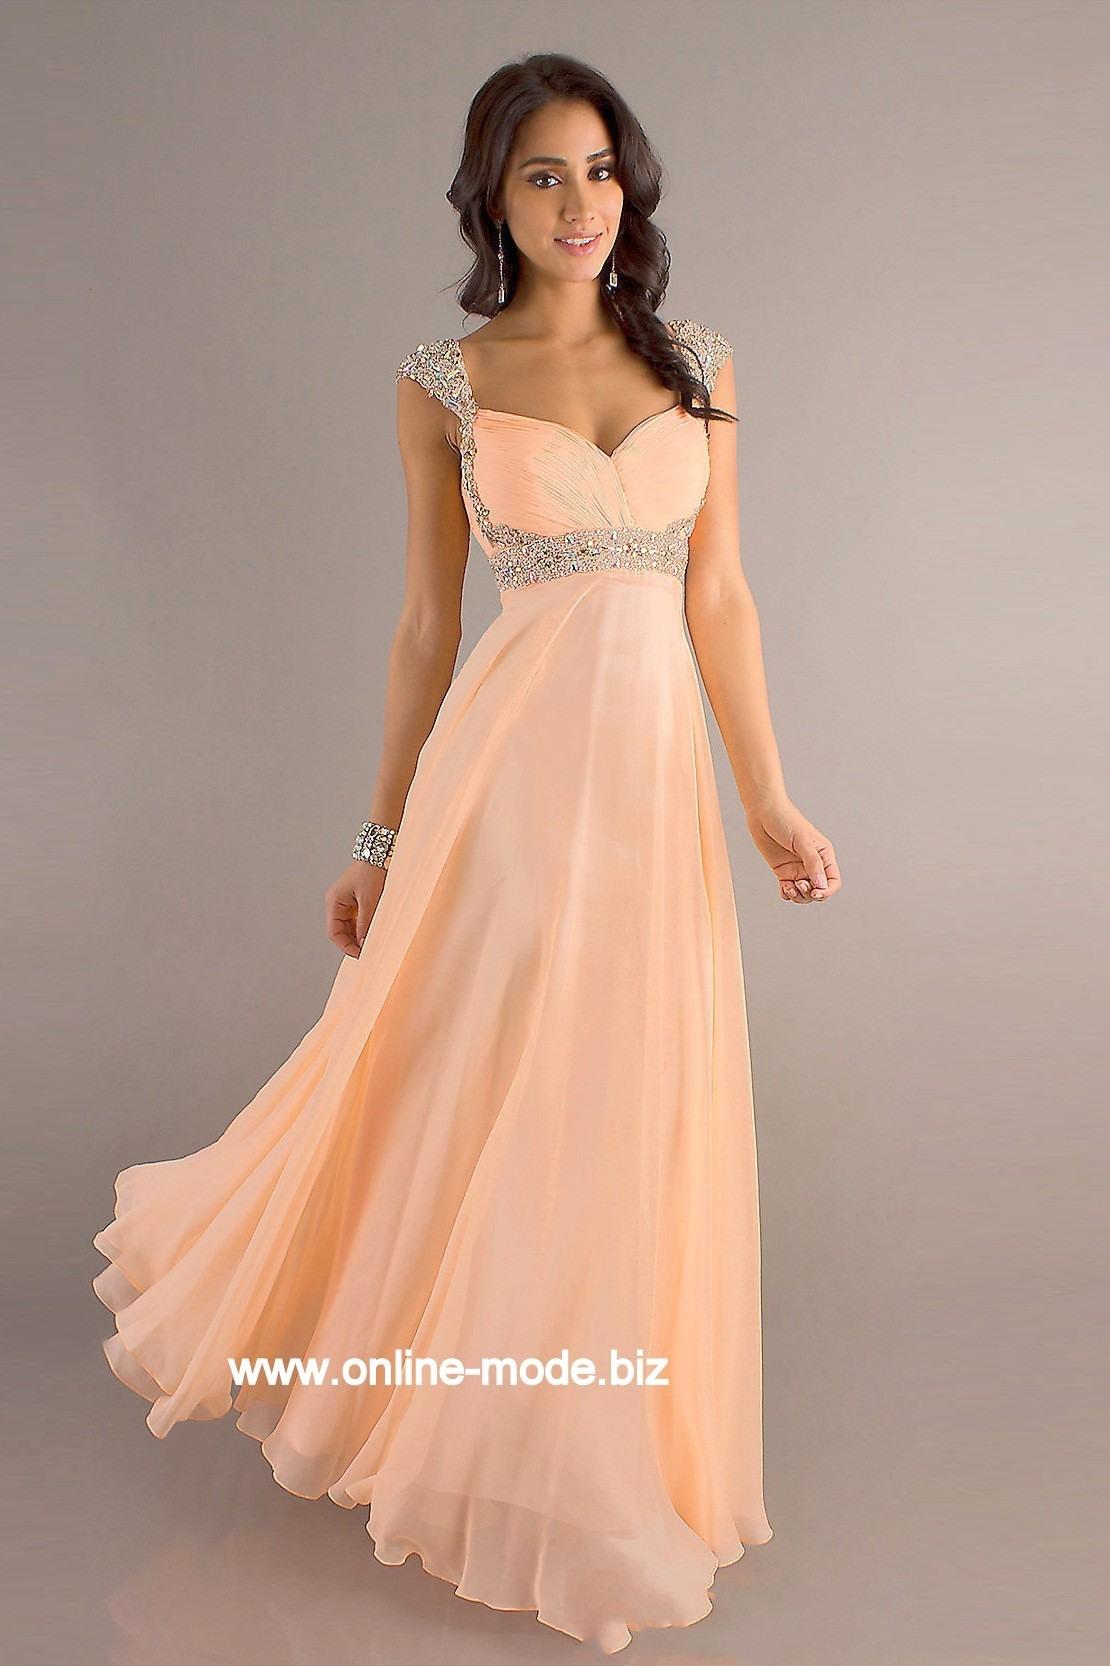 20 Top Abendkleid C&A Stylish17 Genial Abendkleid C&A Spezialgebiet